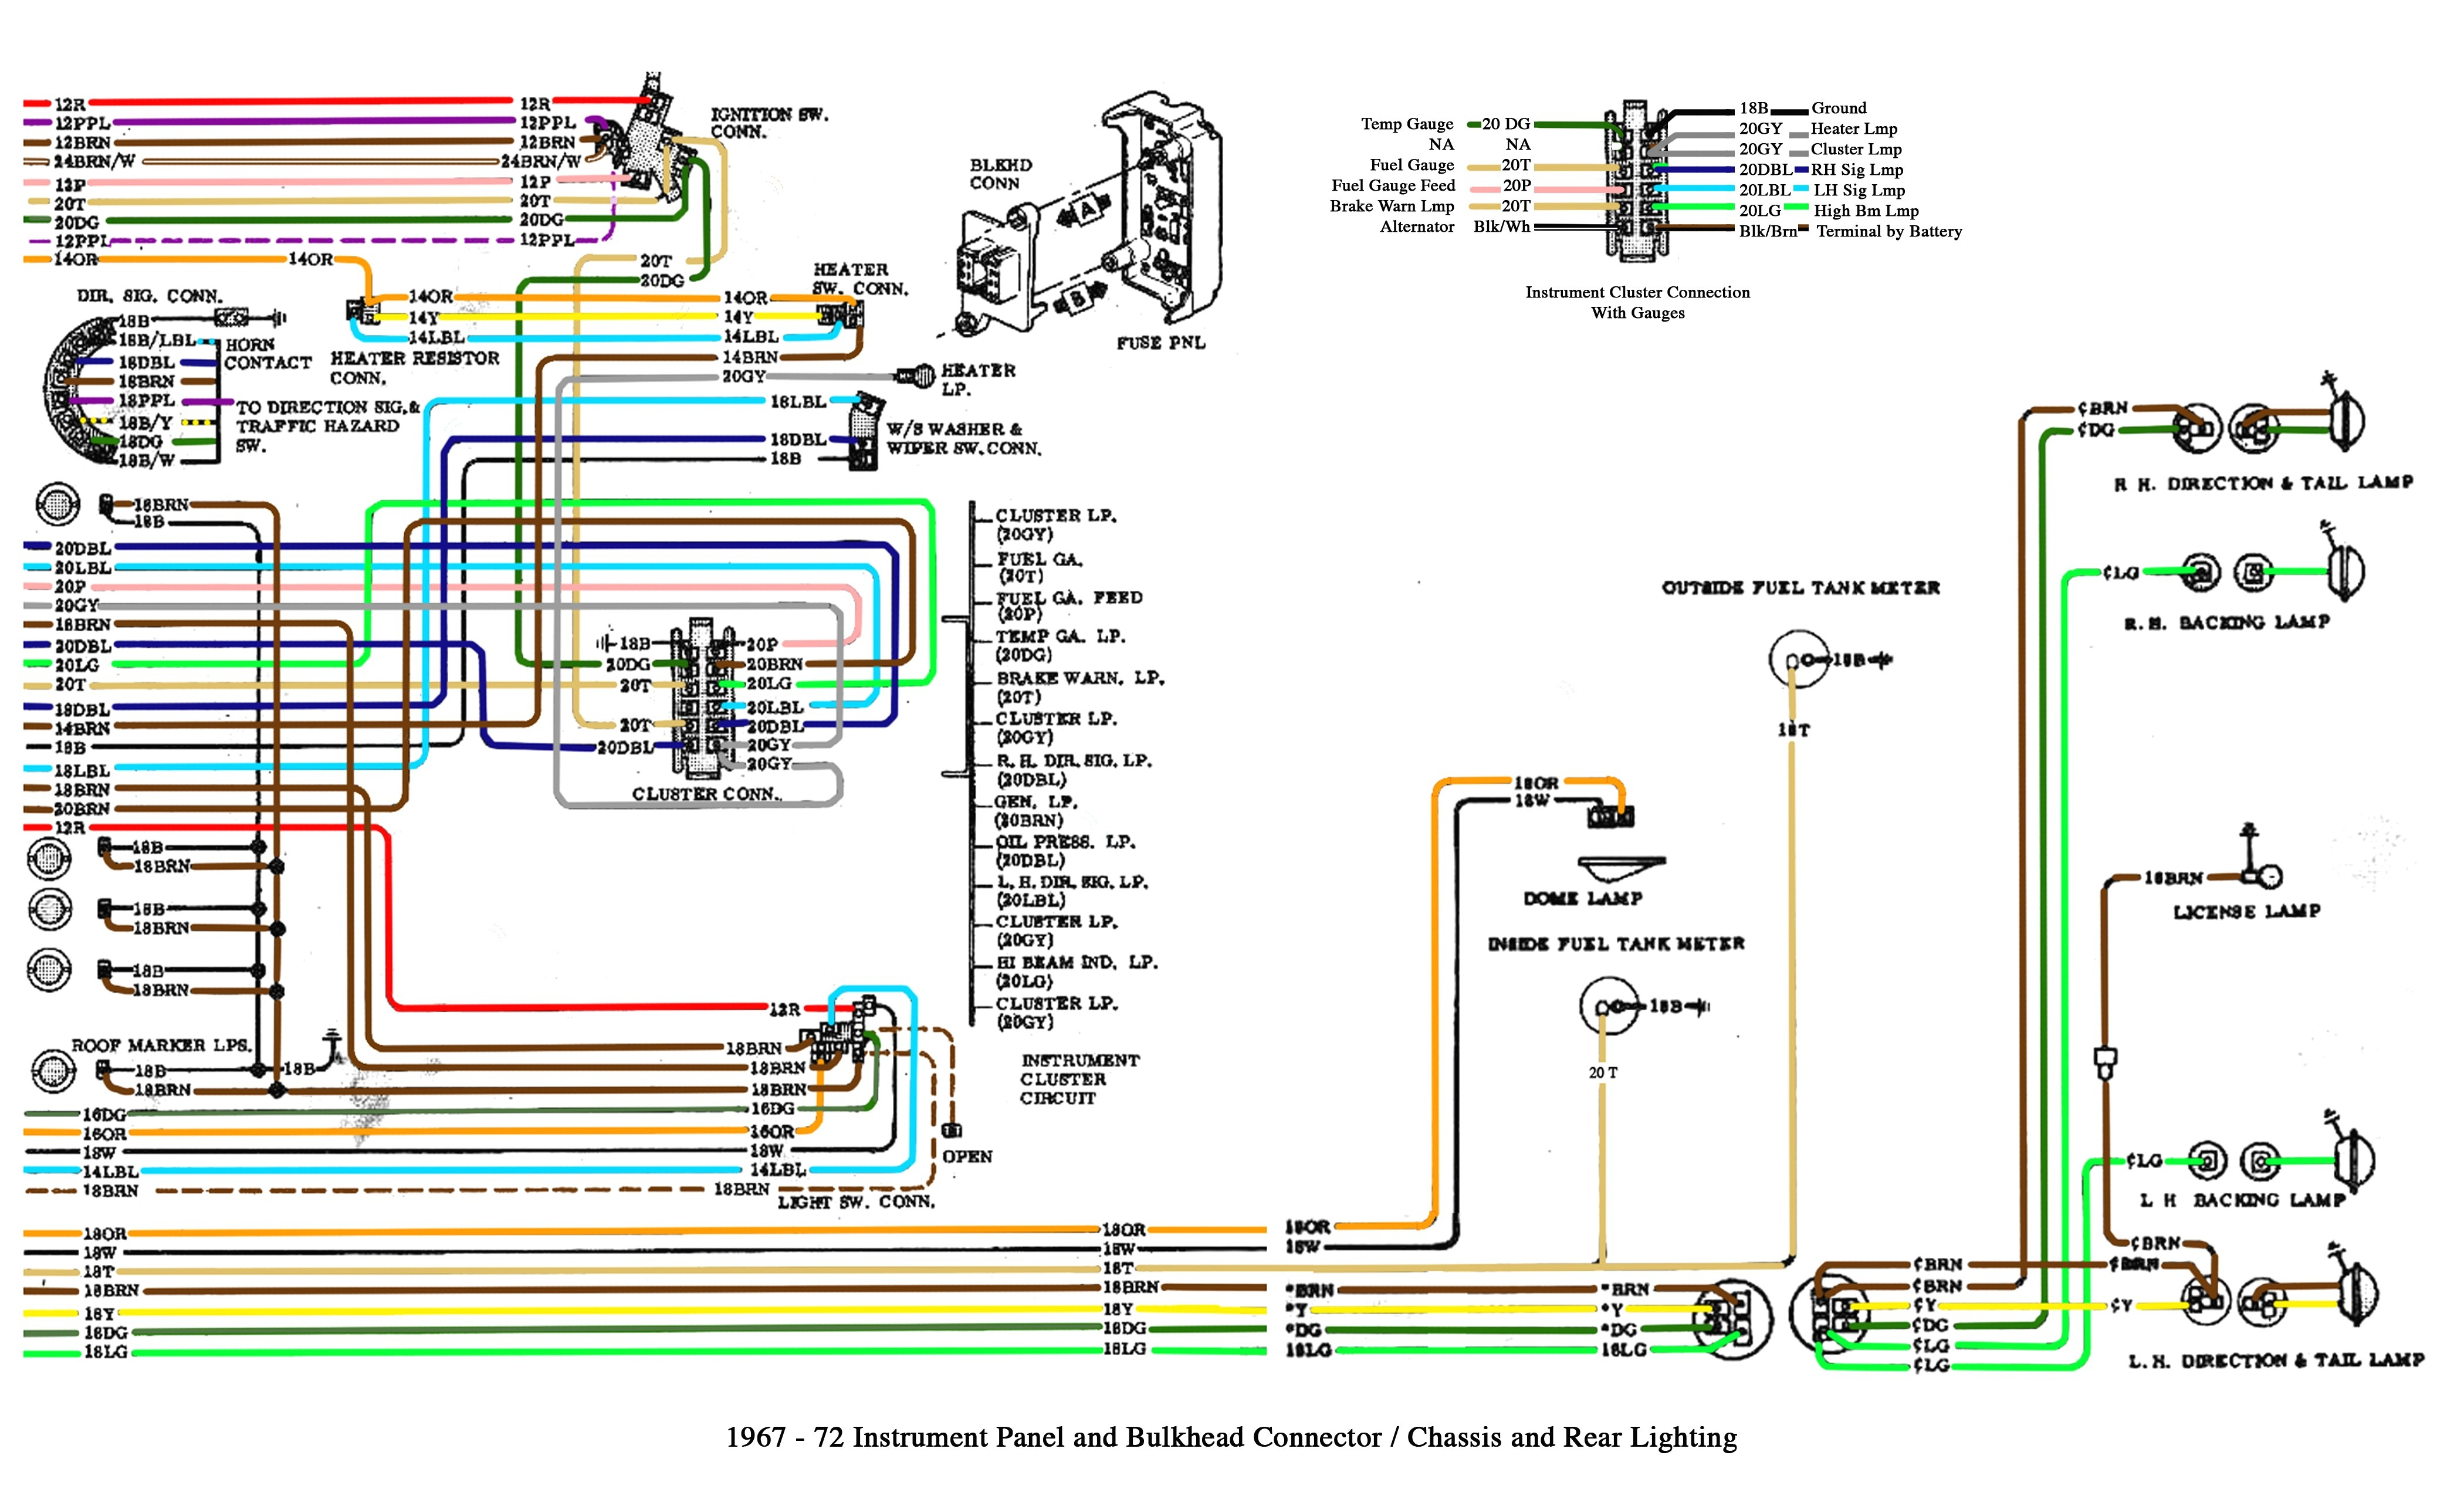 Ta a Wiring Diagram Chevy Truck Tail Light Free Silverado Radio 2013 Fog Toyota Stereo Full